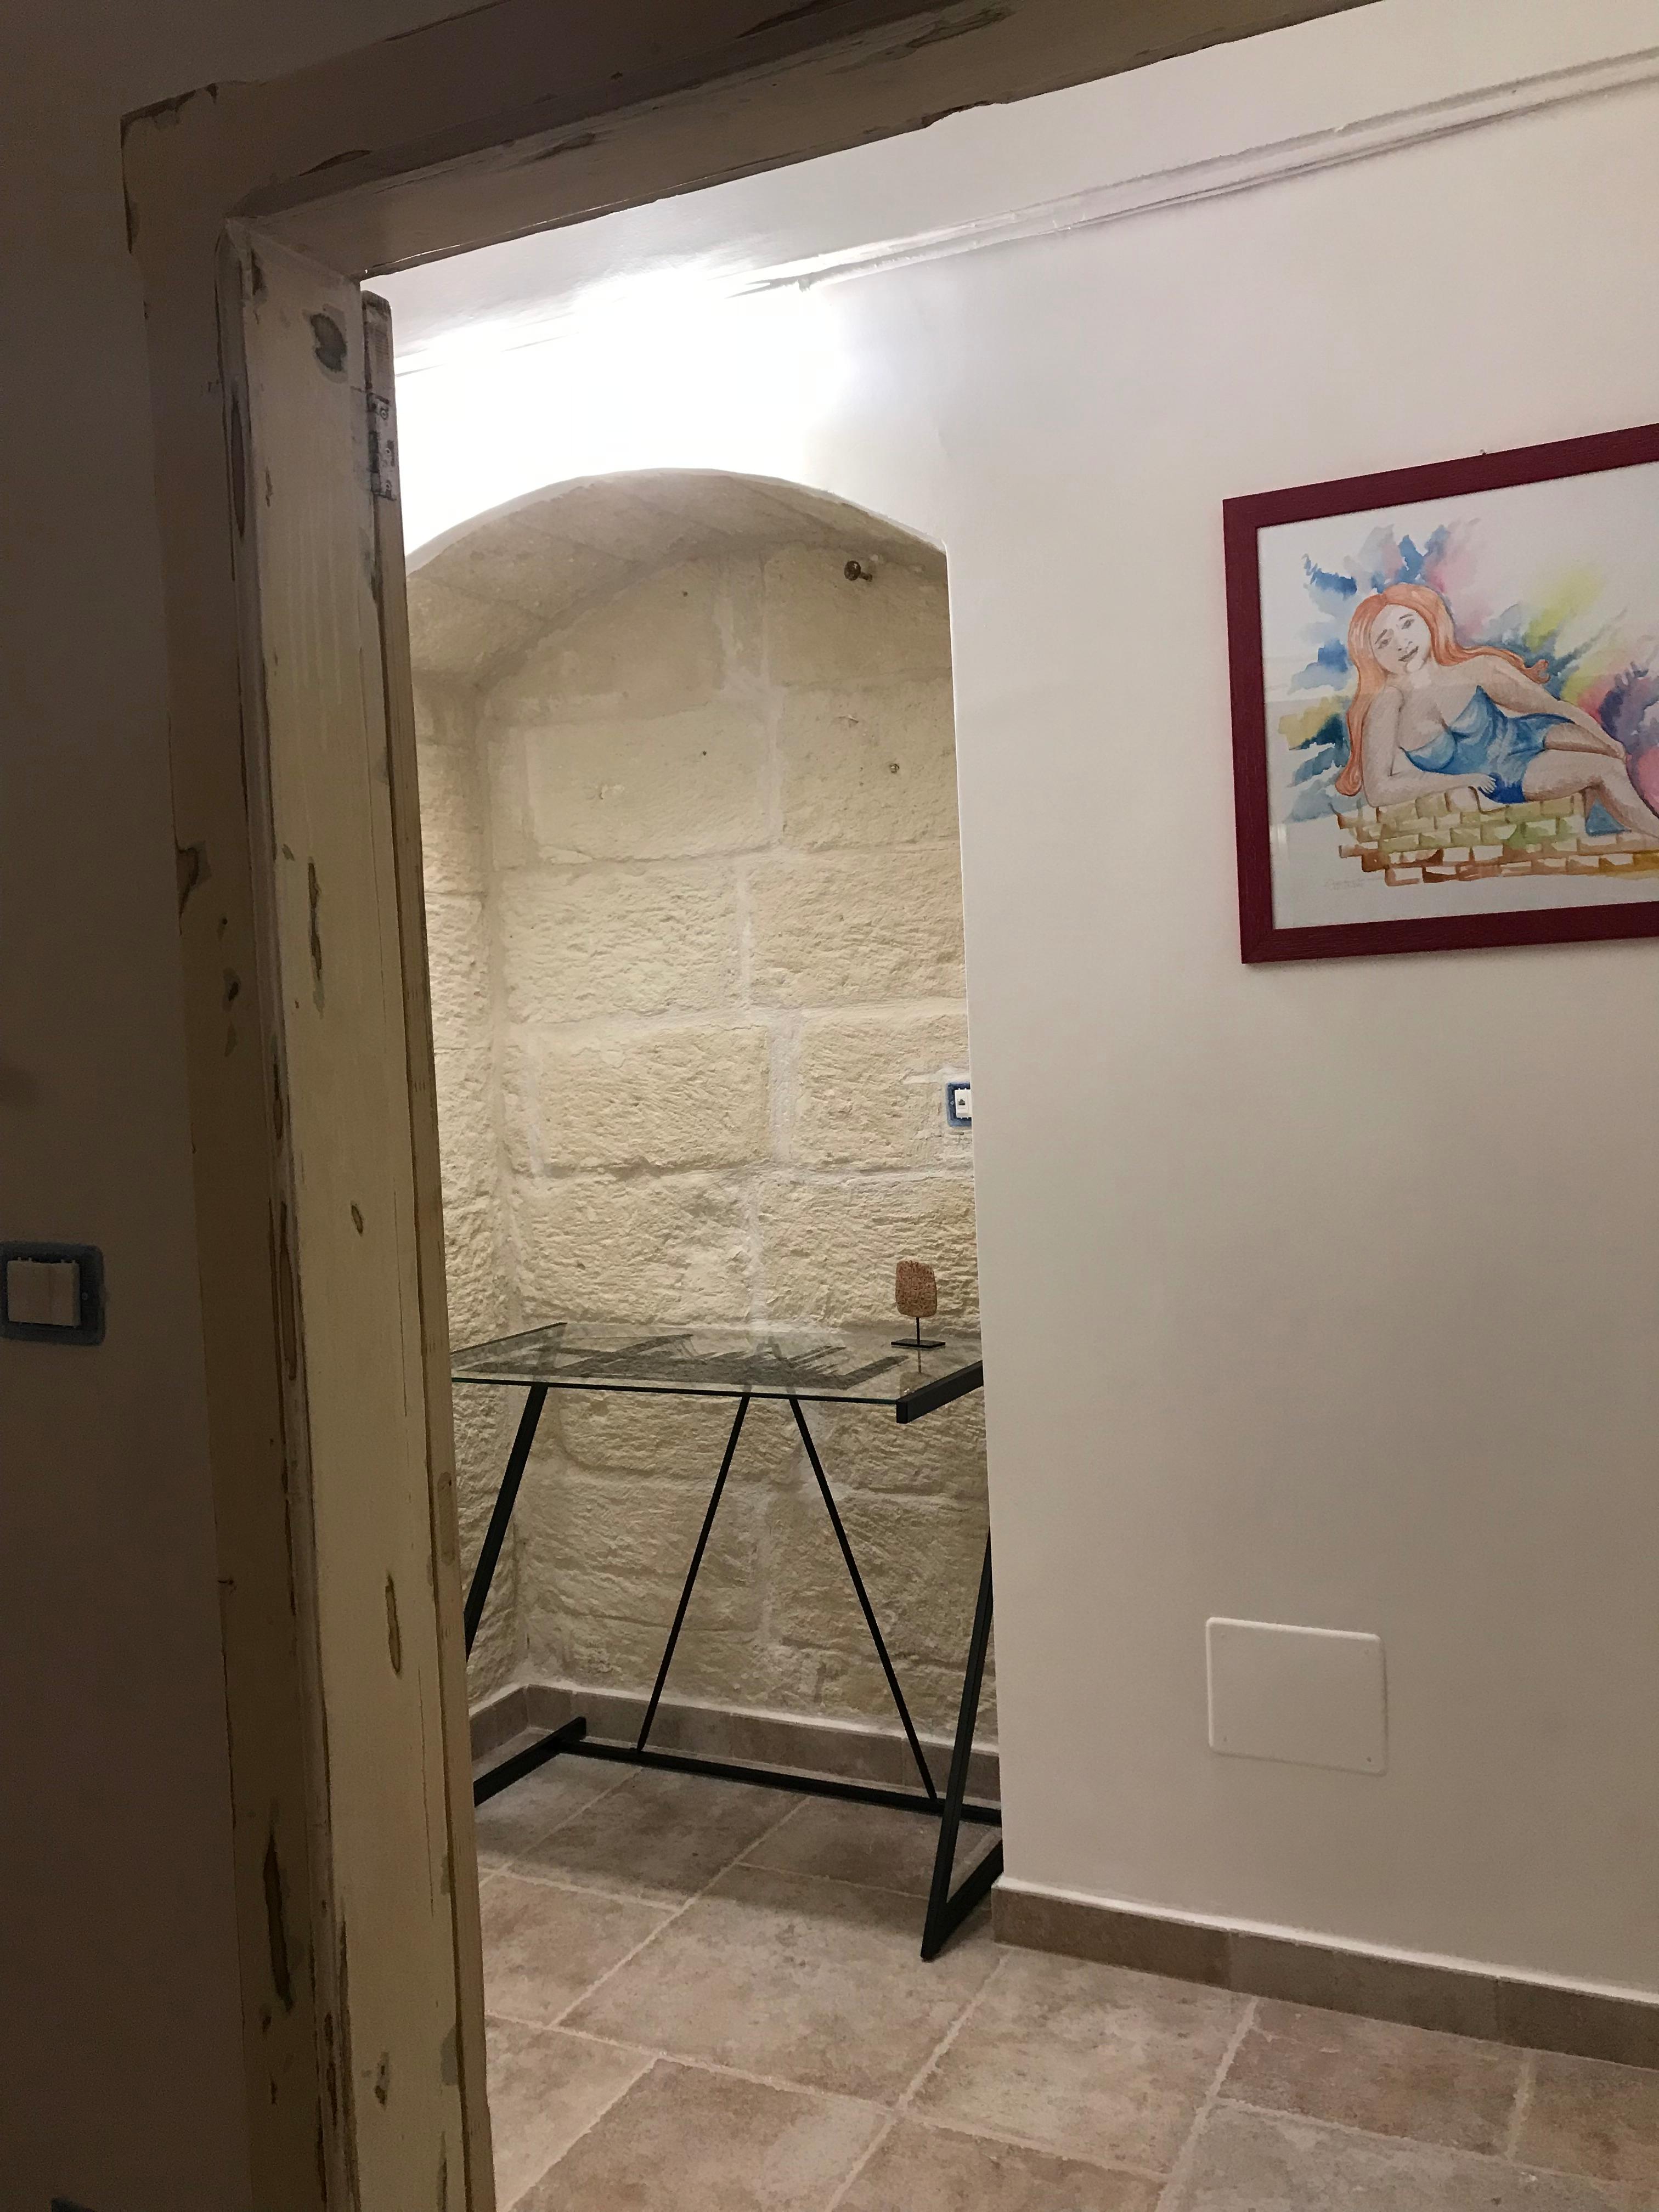 Ferienwohnung Parva Domus in Matera (2598921), Matera, Matera, Basilikata, Italien, Bild 3